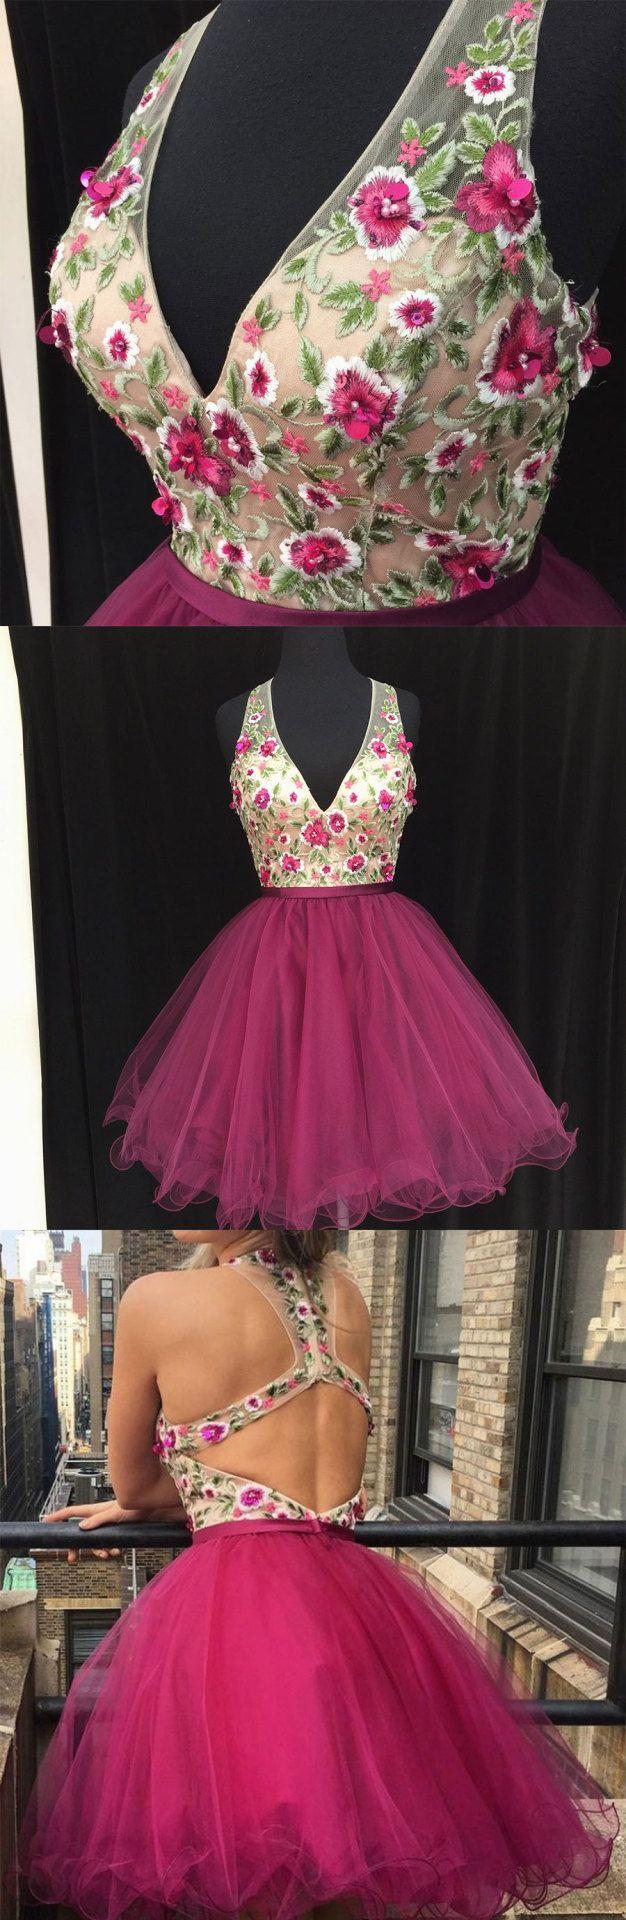 robe parfaite pour bal promo fin dannee 10